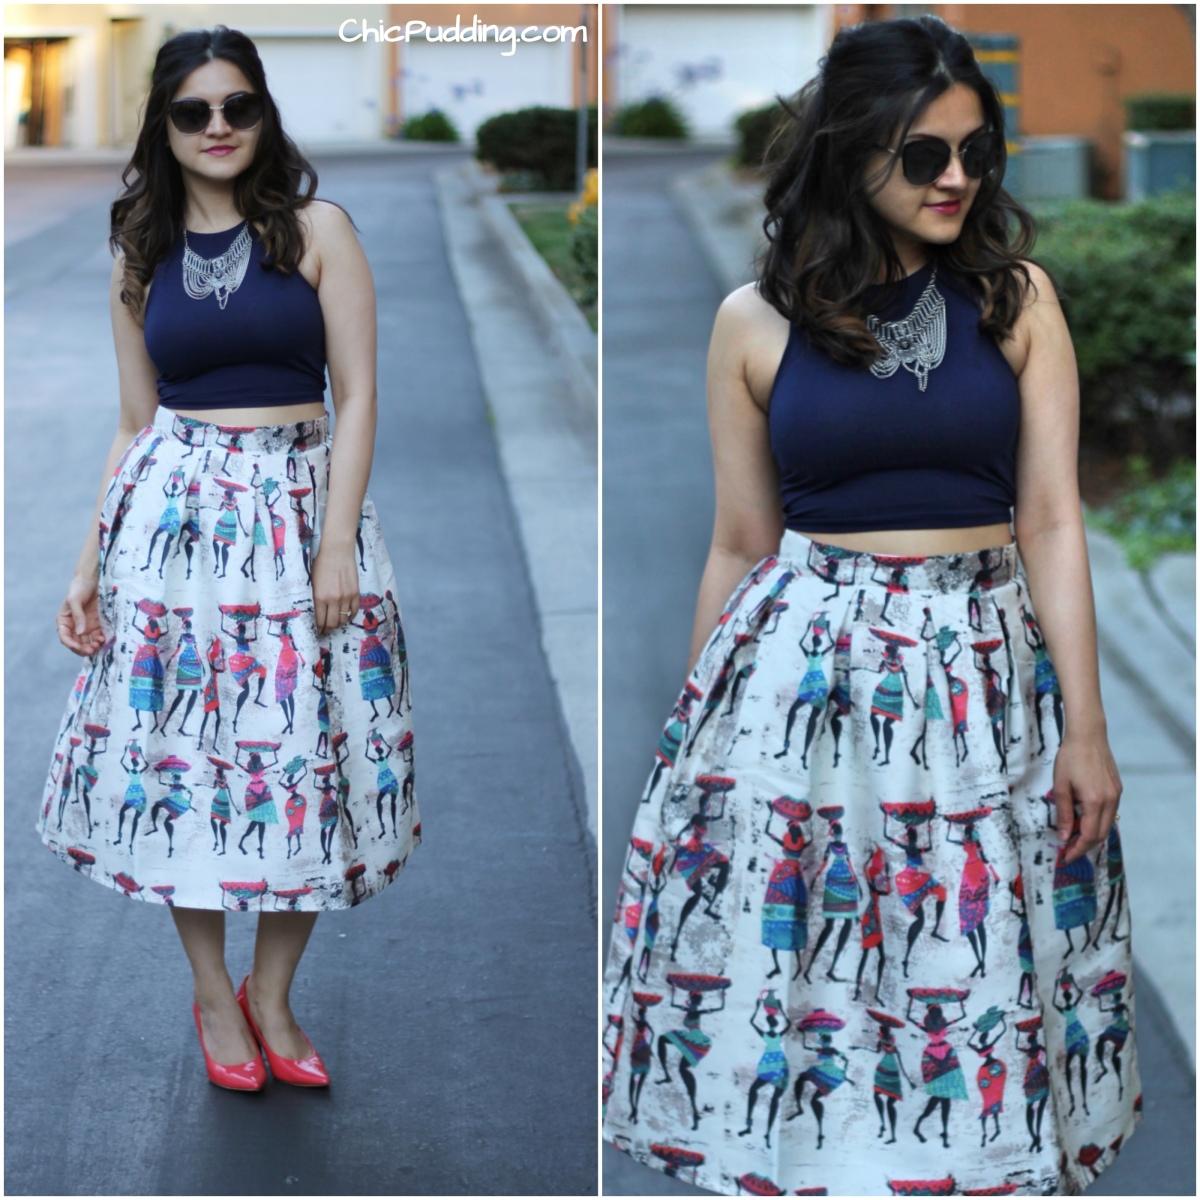 97ab347e6bfe9 My inspirational feminist skirt! – Chic Pudding